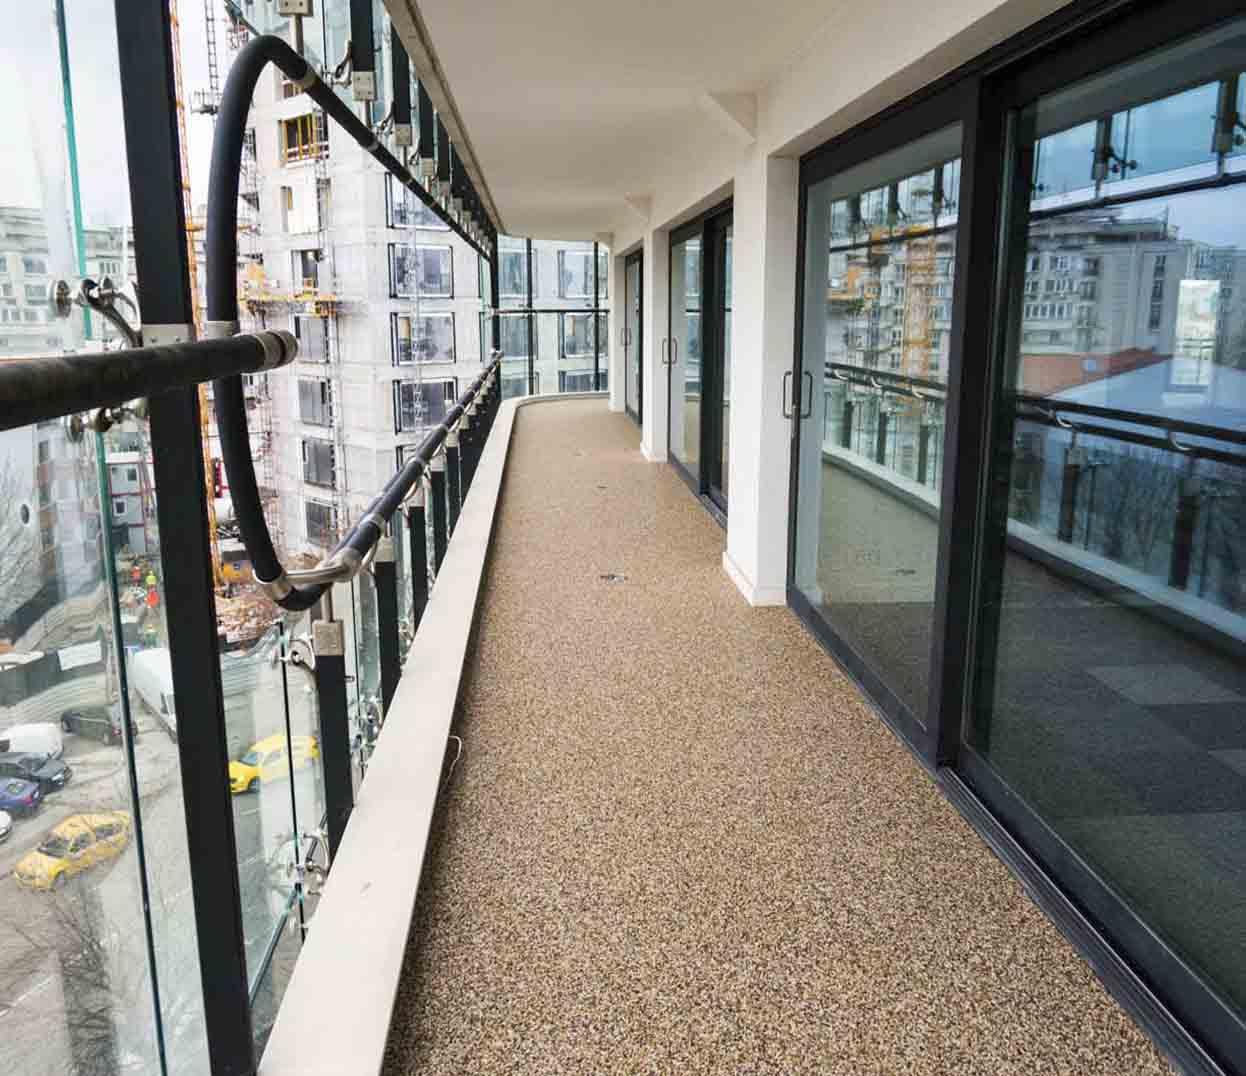 viarustik-stone-carpet 13